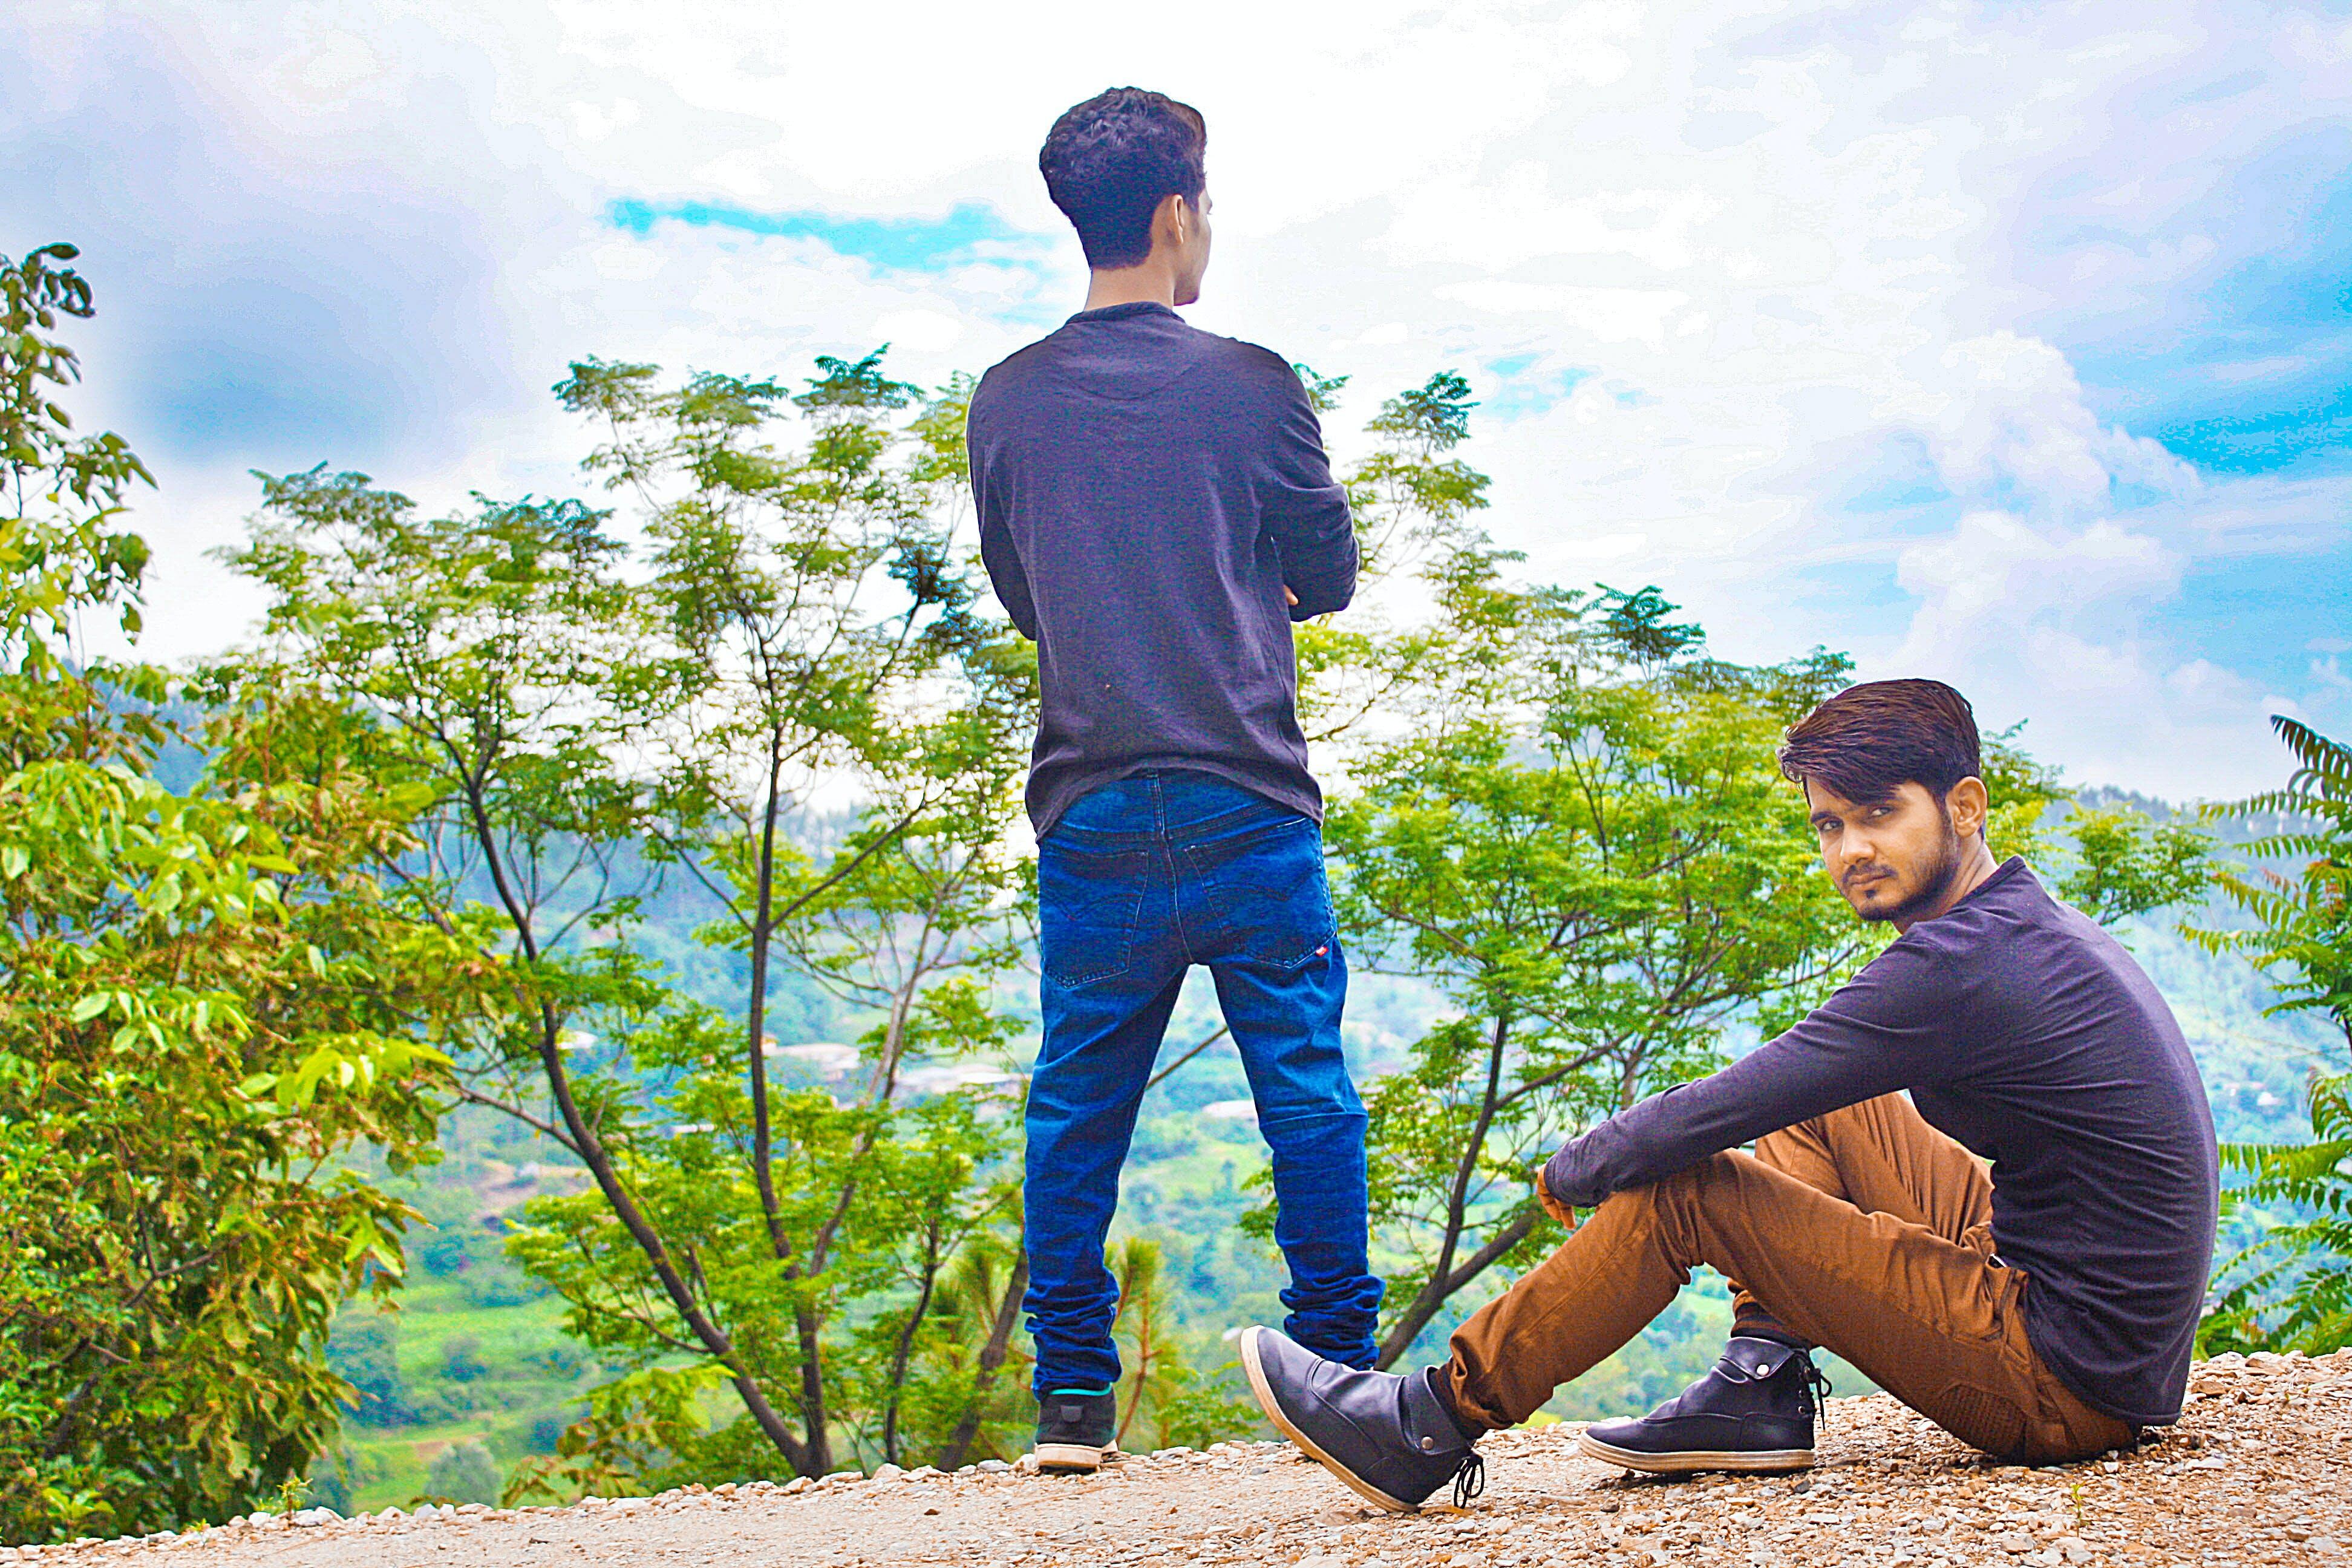 Free stock photo of advanture, back view, beautiful view, city view